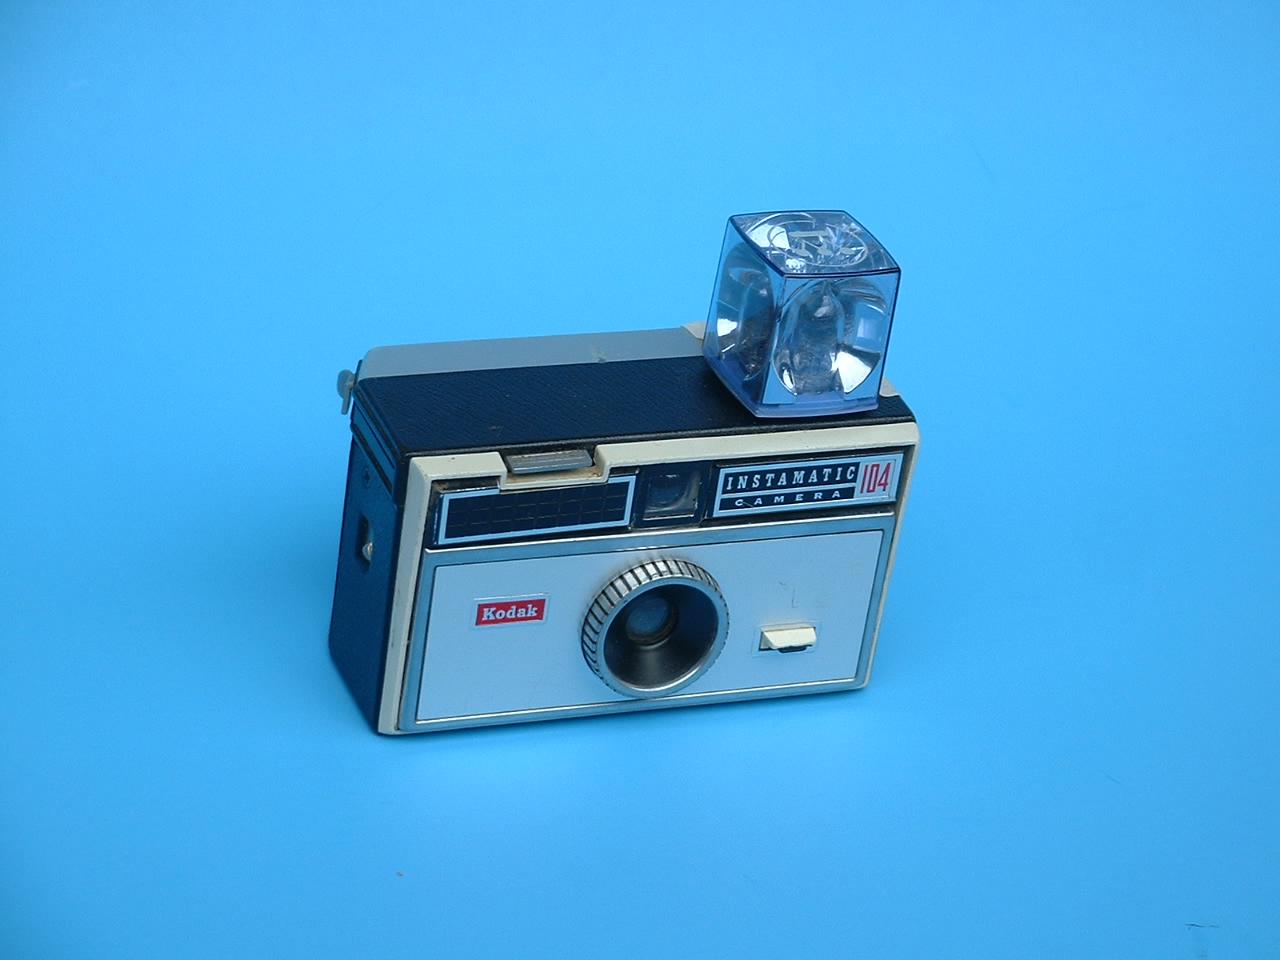 Picture of Kodak Instamatic 104